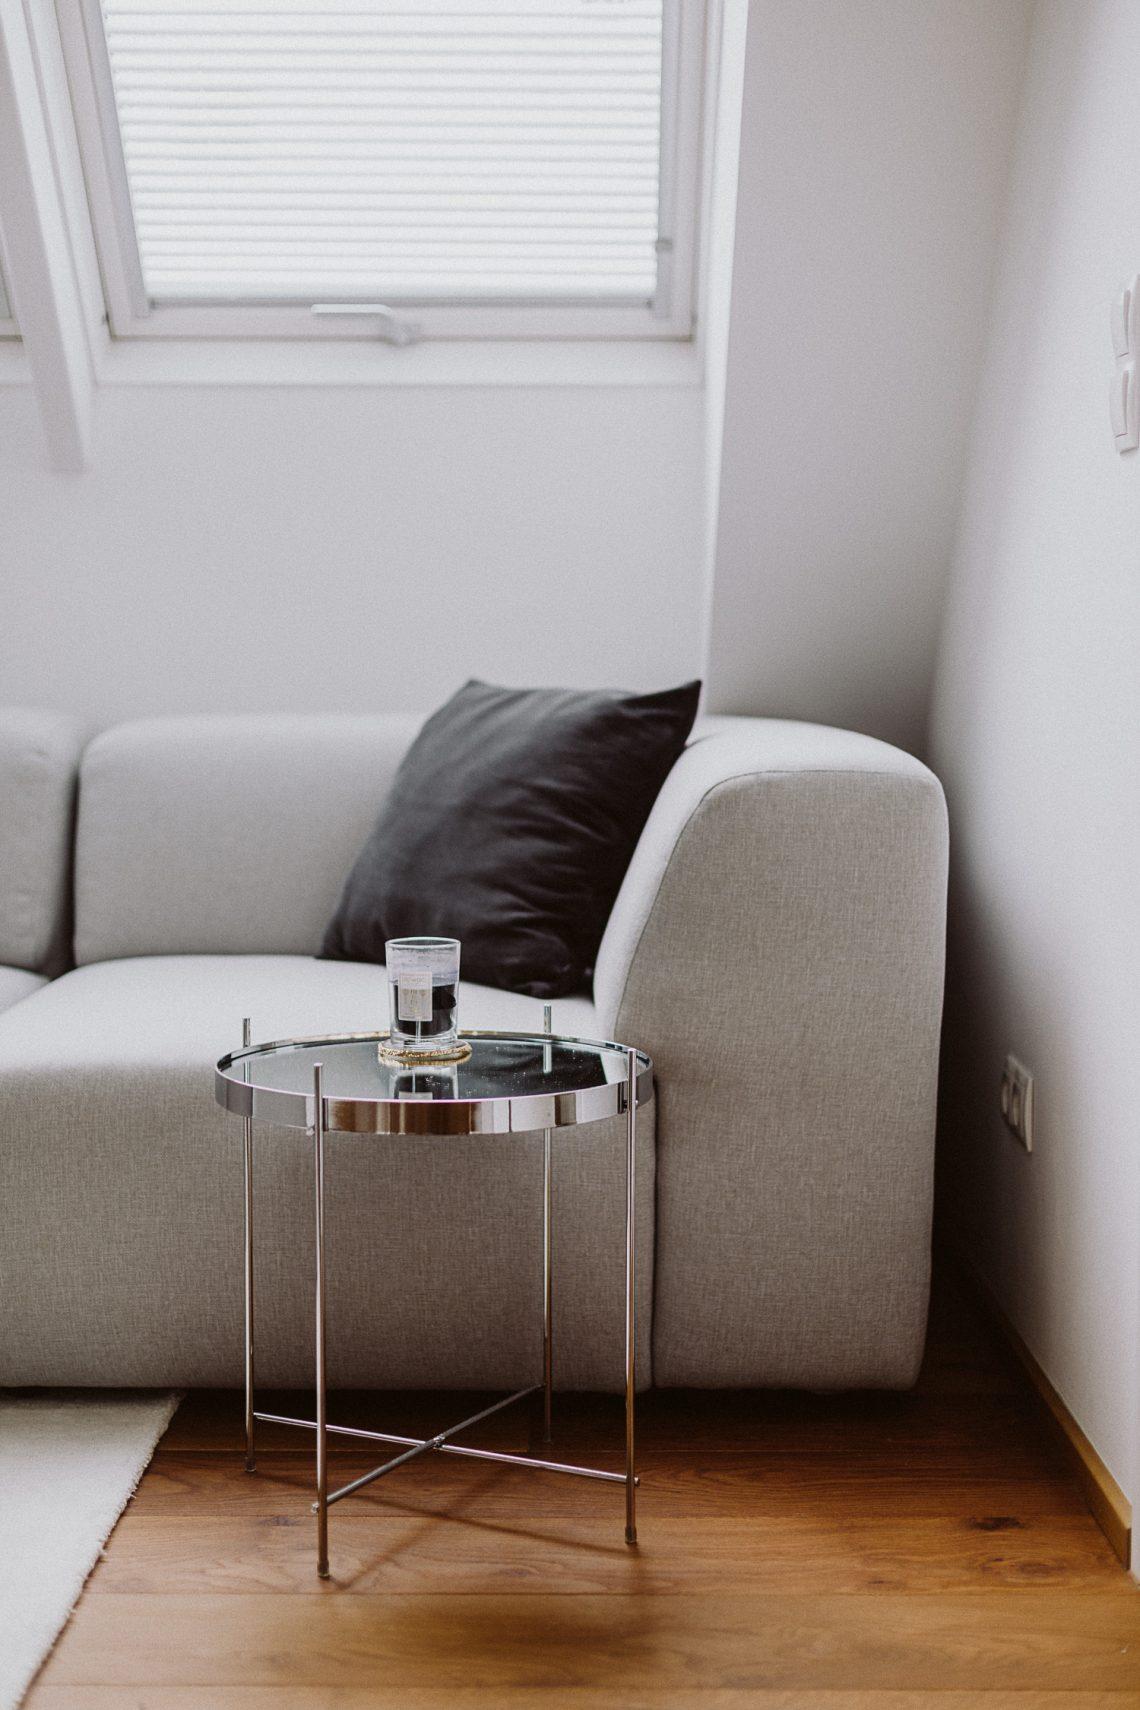 Top 3 Sofa Trends 2019: Was wir aktuell lieben - Love Daily Dose